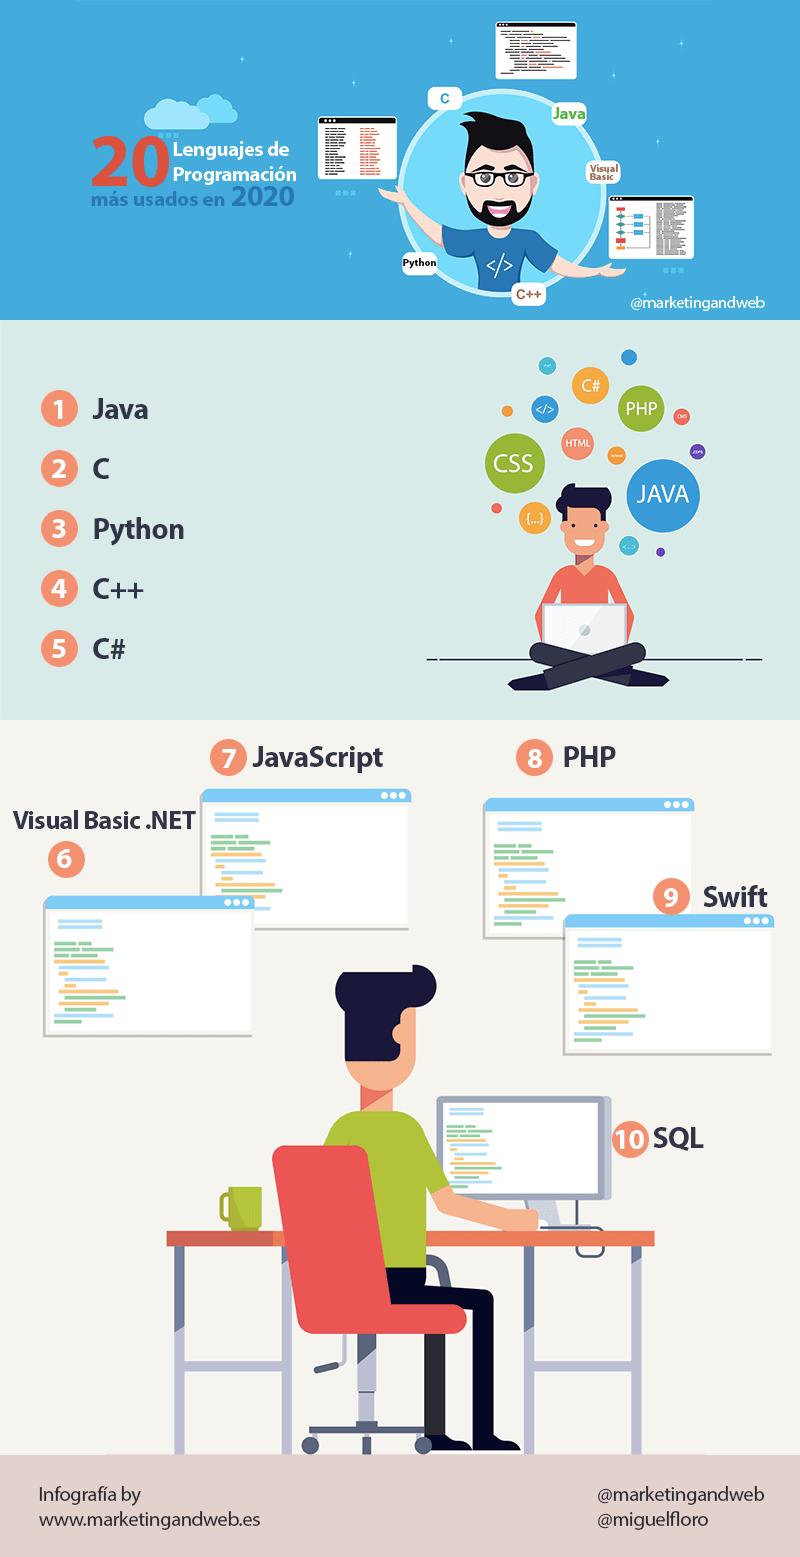 lenguajes de programación más usados en 2020 infografía